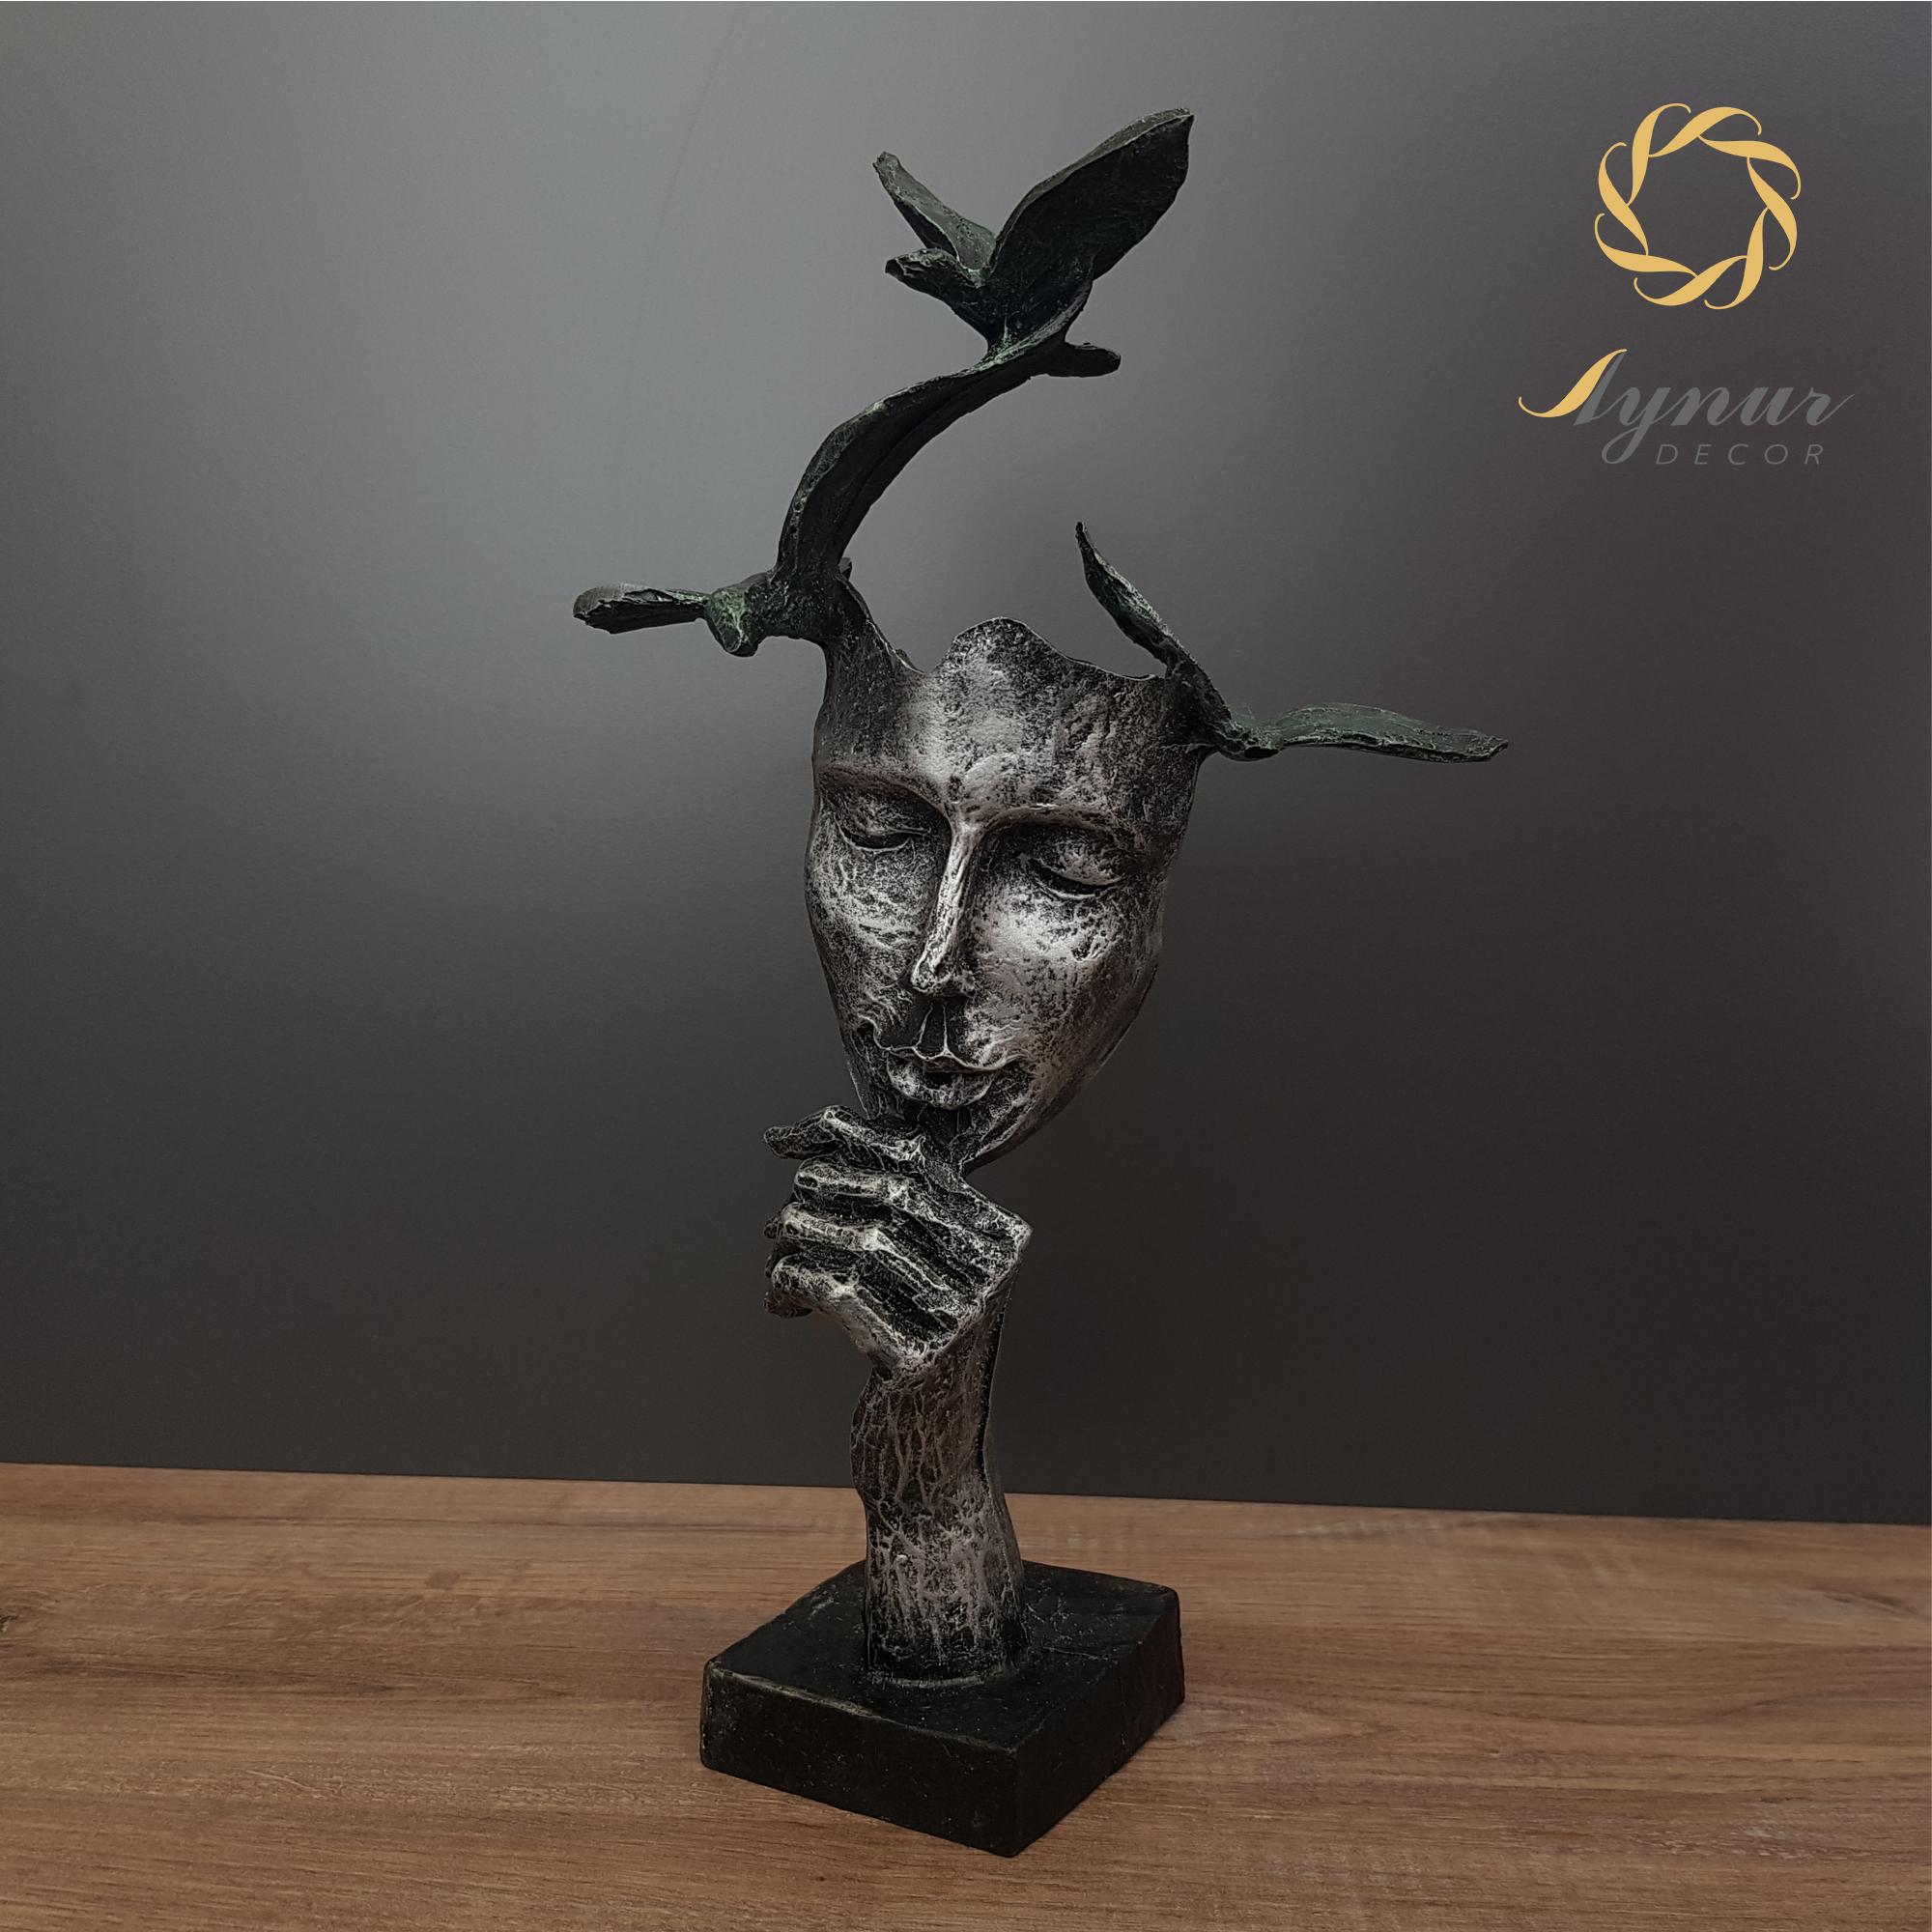 Philosopher Free Thinker Man Statue Abstract Unique Statue Sculpture Face Silent Man Figurine Statue Sculpture Free Thinker